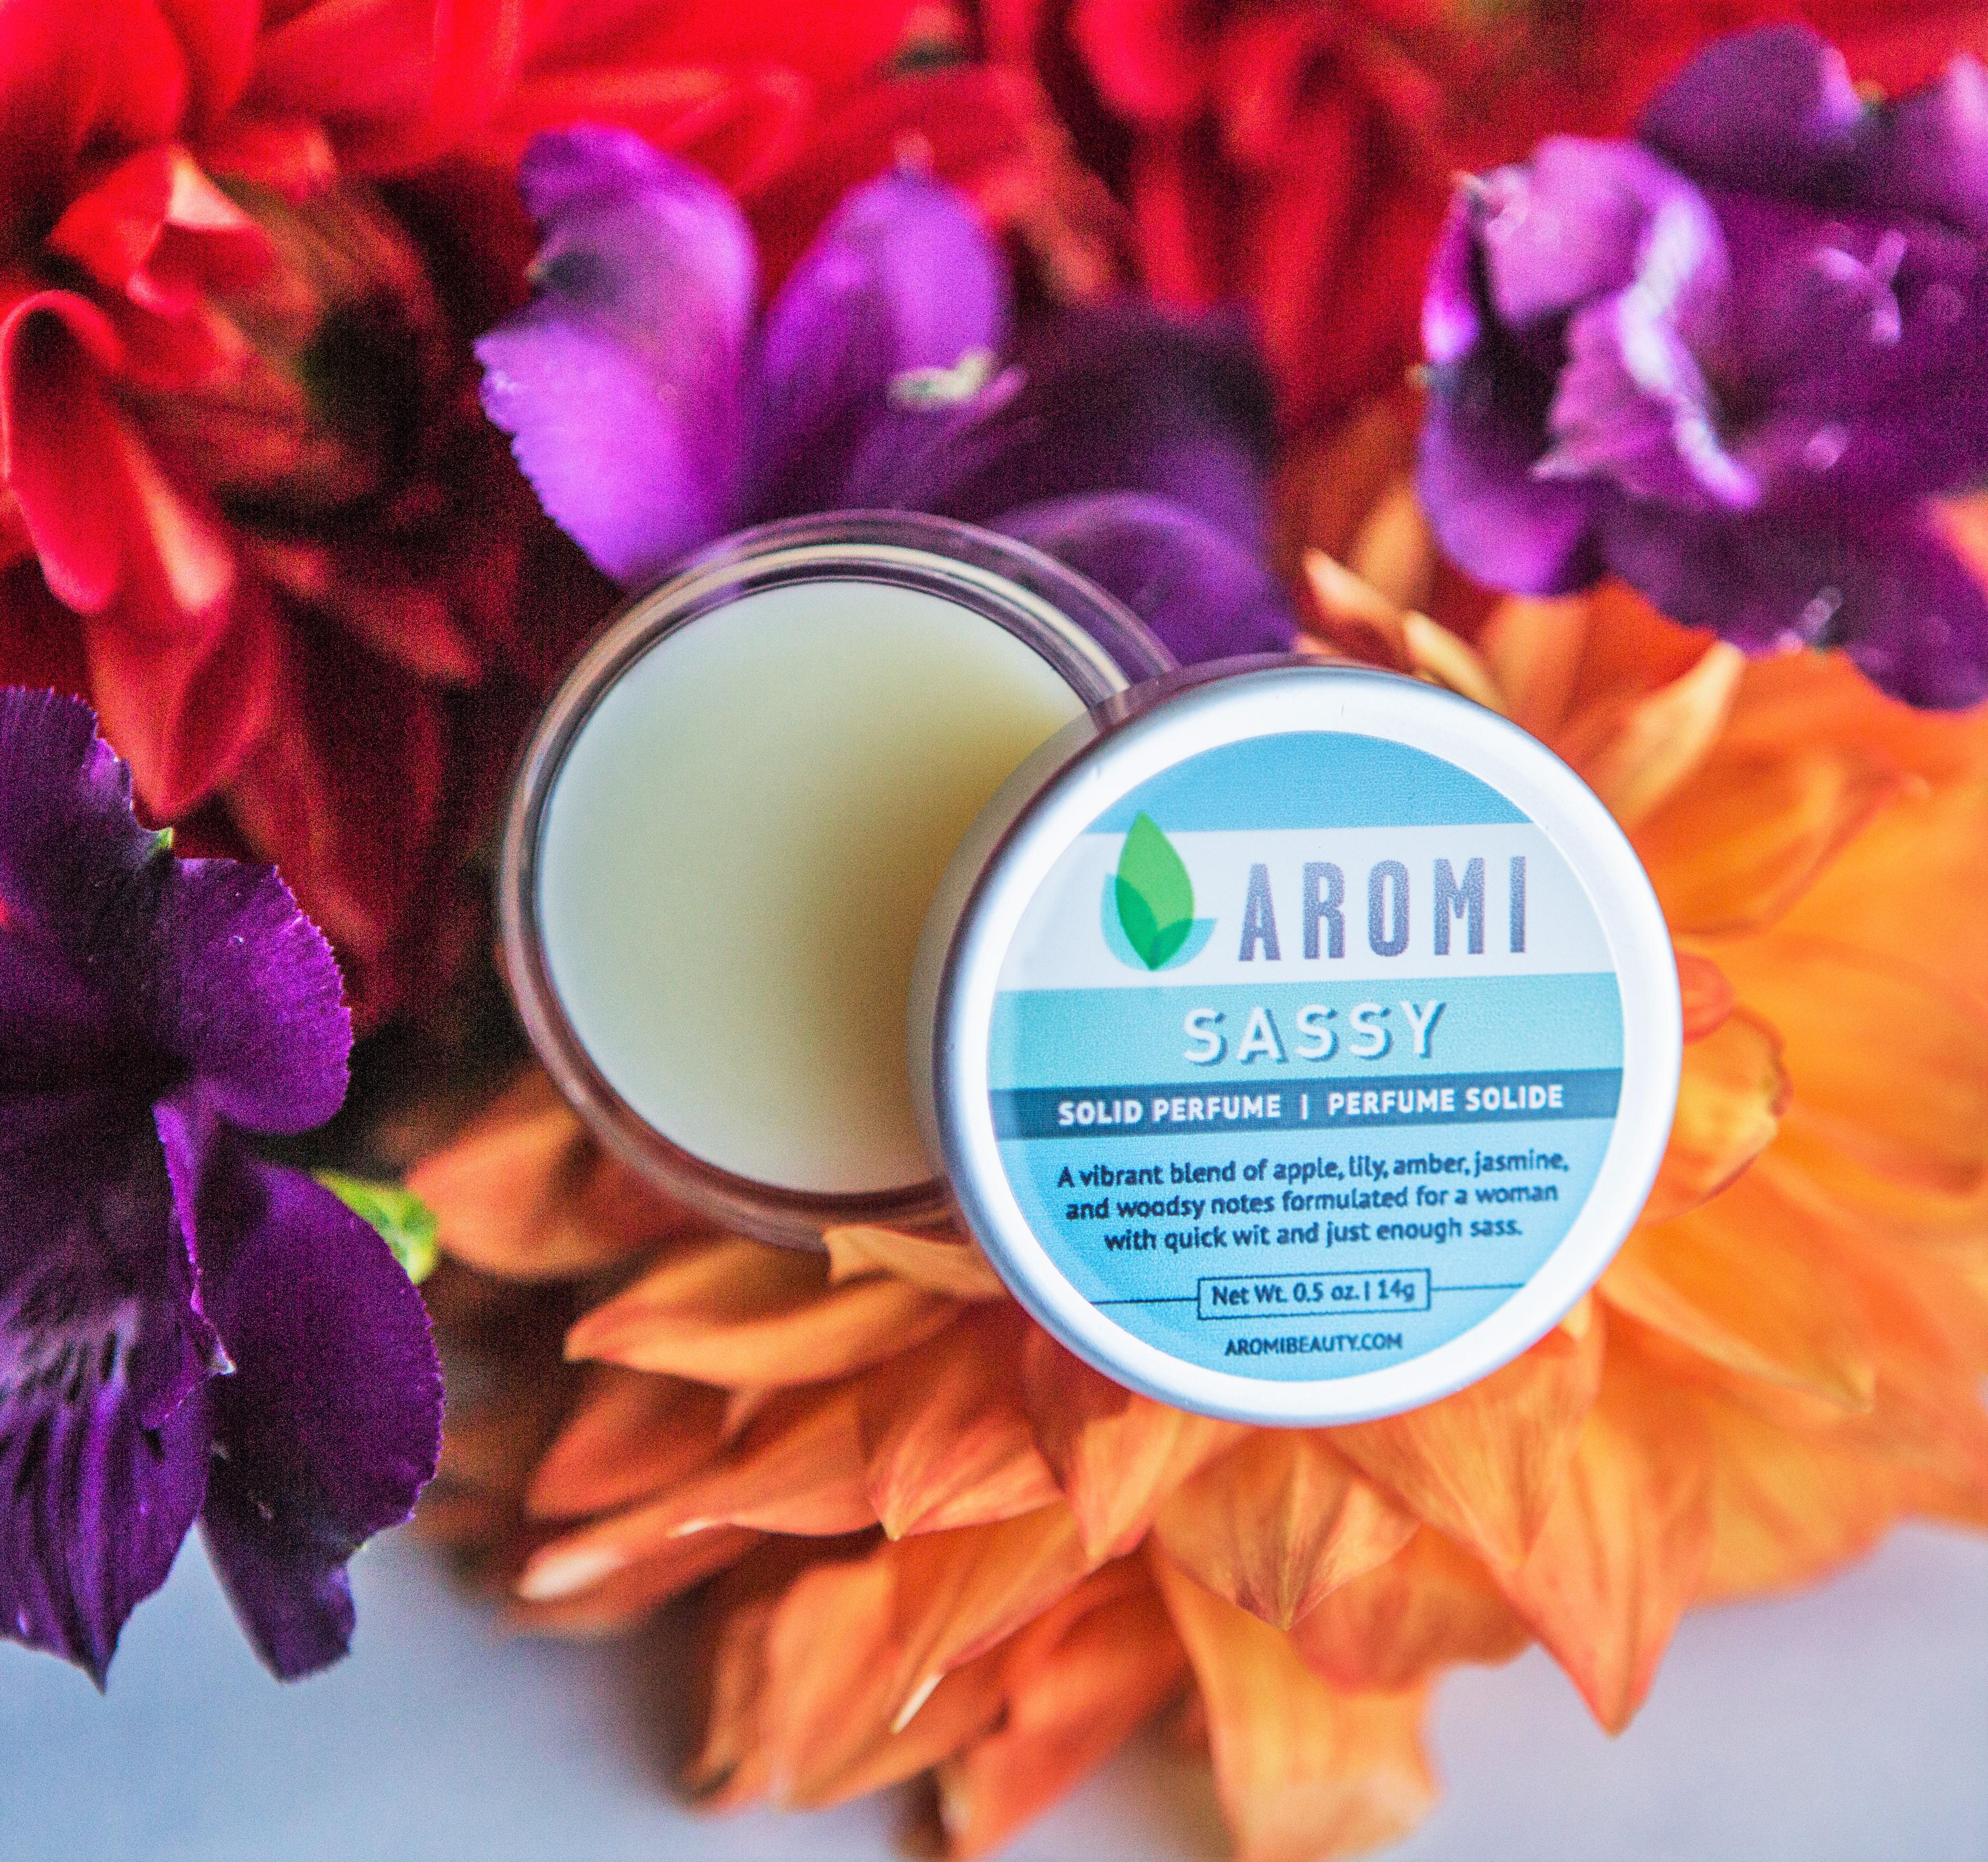 Aromi Sassy Solid Perfume